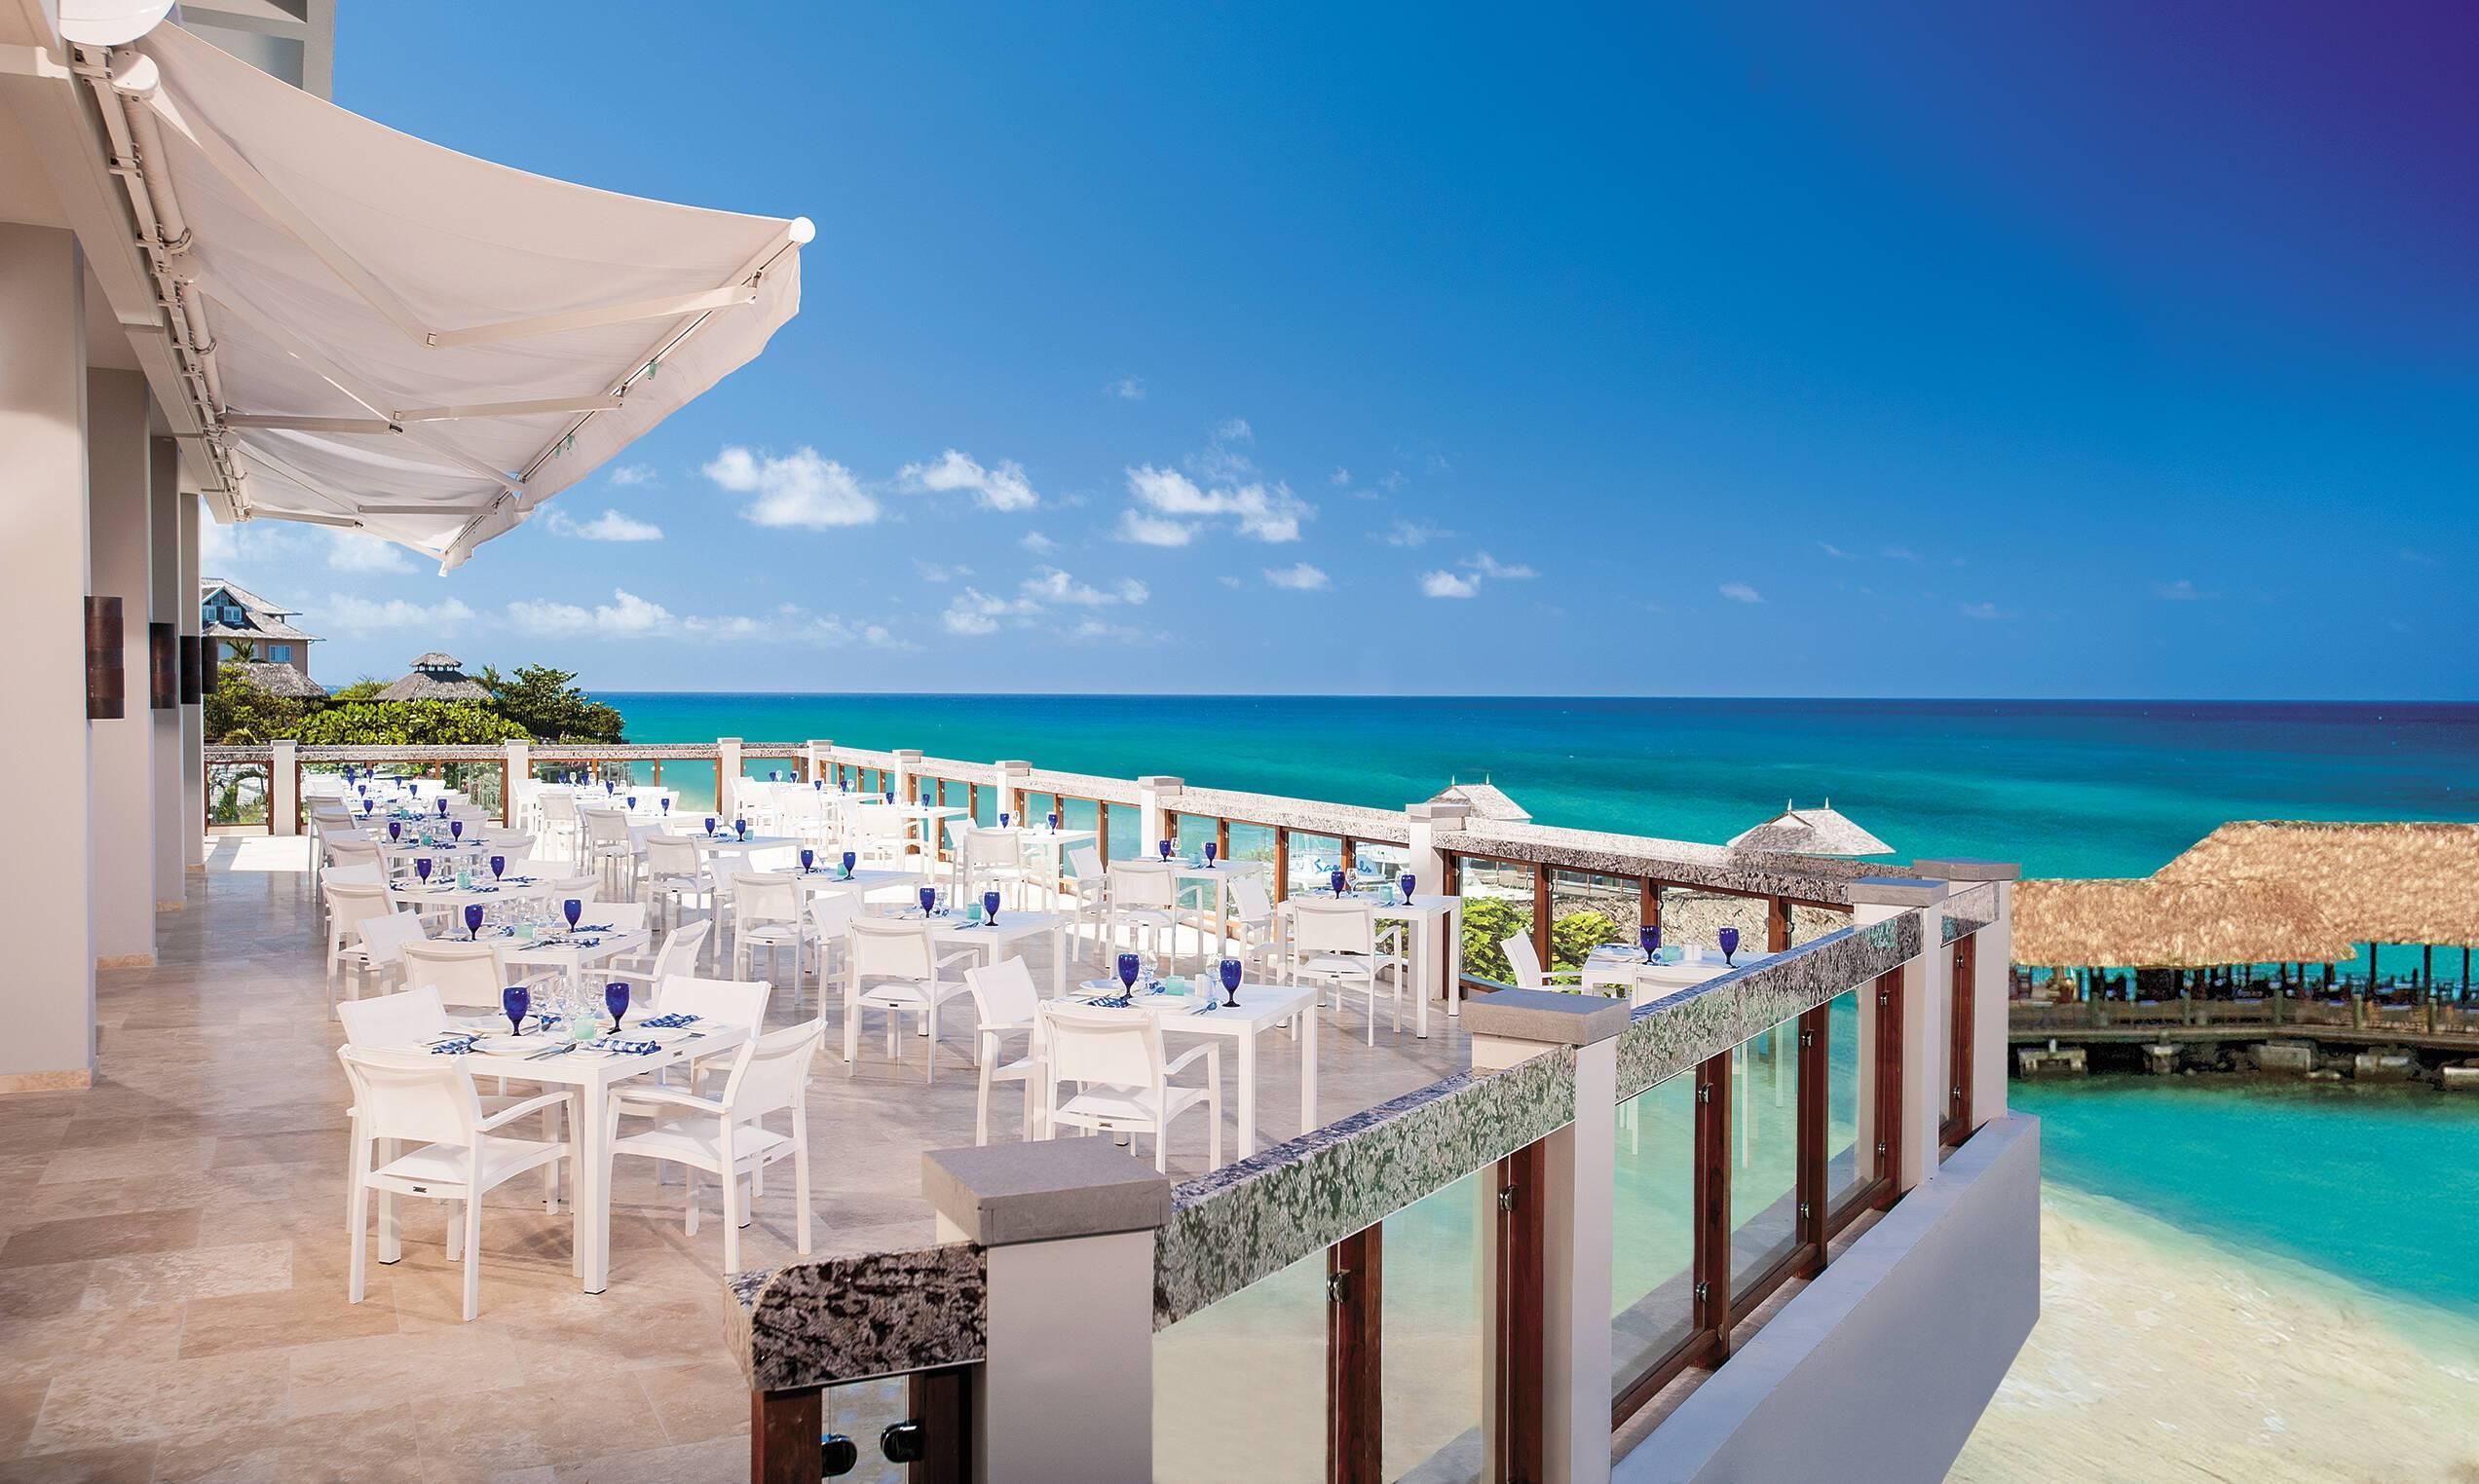 Sandals Ochi Beach Jamaique Restaurant Terrasse